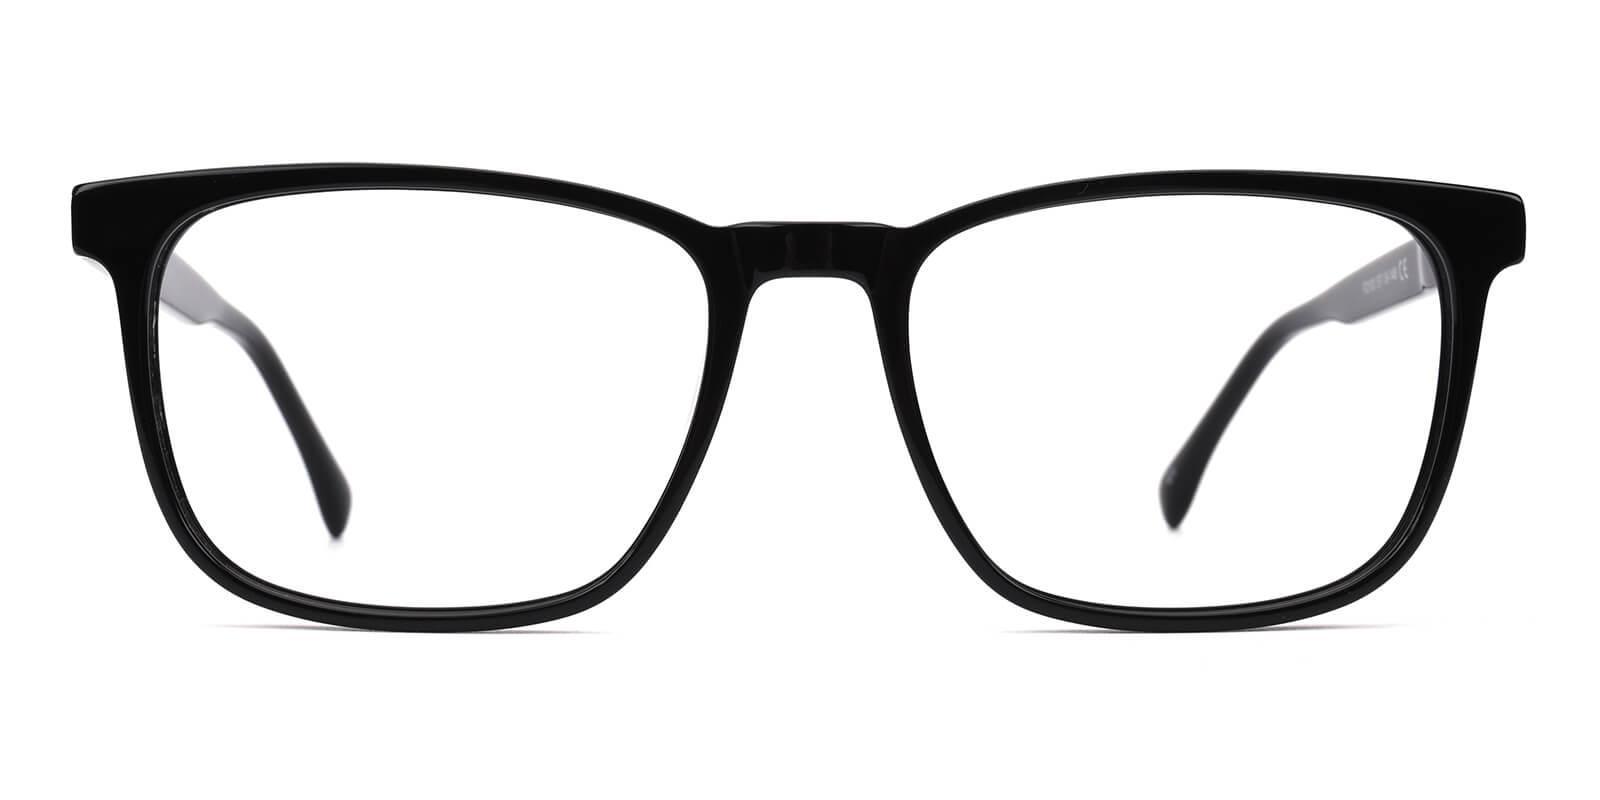 Tages-Black-Square-Acetate-Eyeglasses-additional2